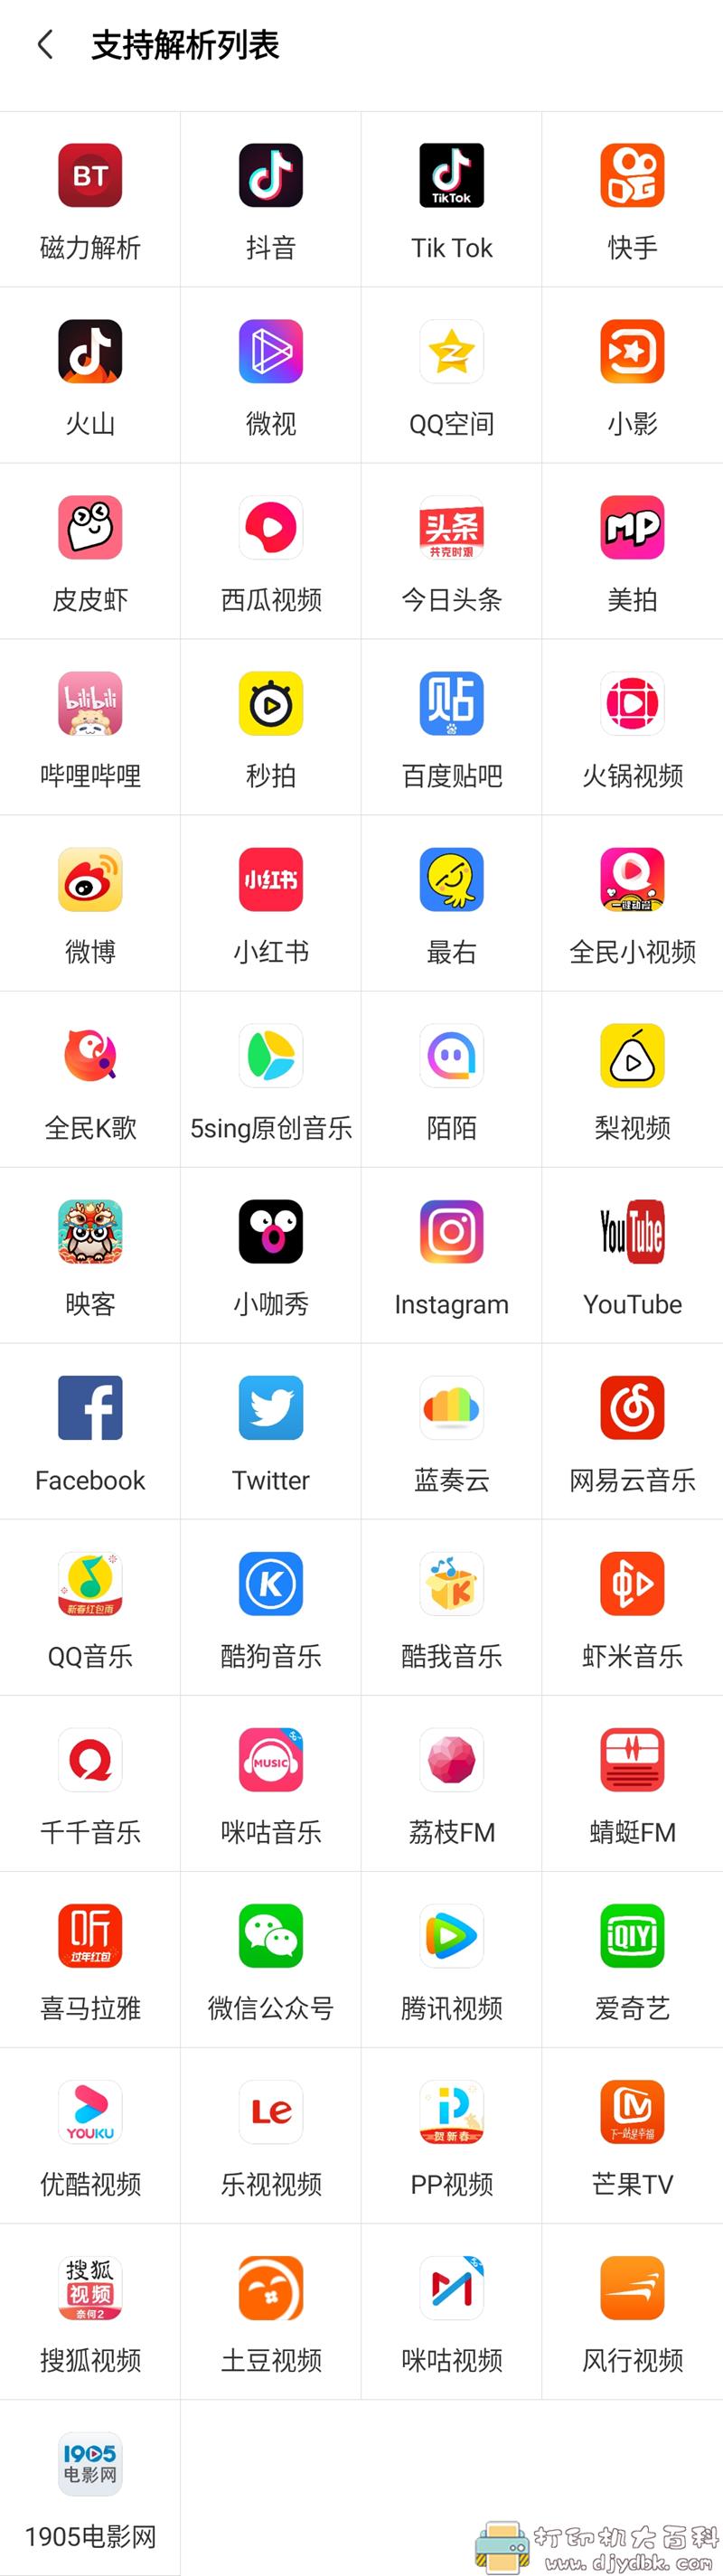 [Android]全能下载神器 – 快下载,支持多平台视频无水印解析下载图片 No.2